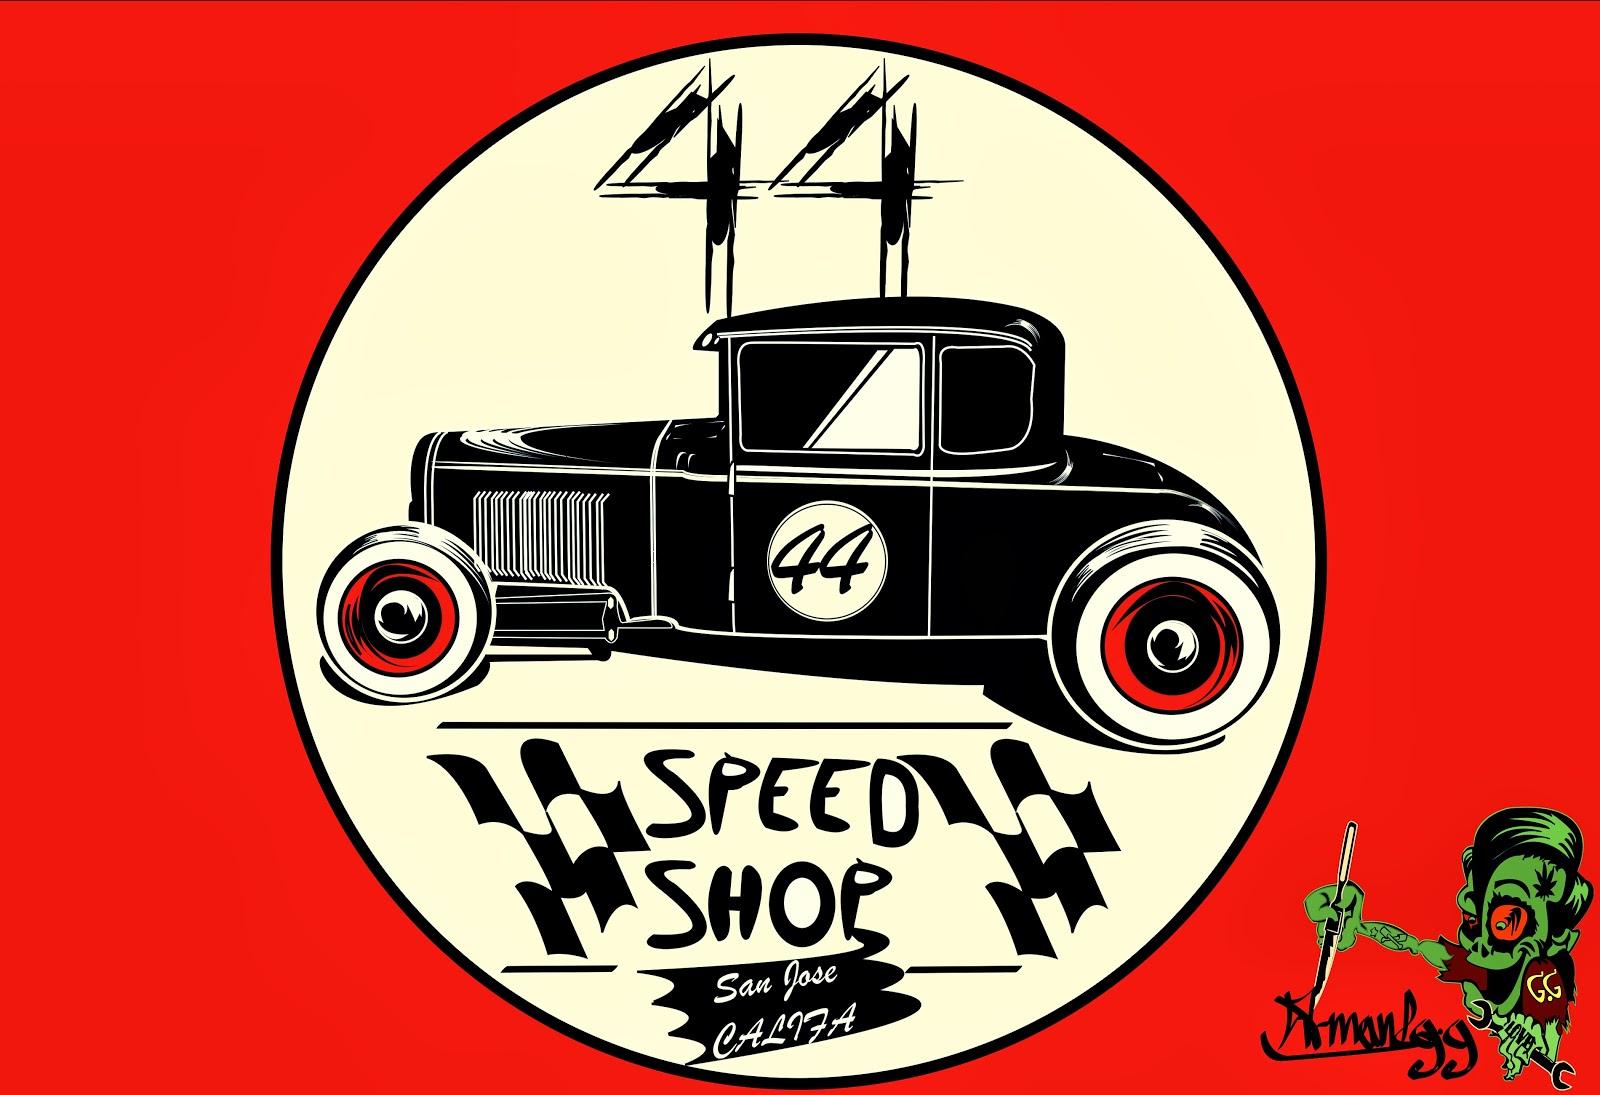 Vintage Speed Shop Logos Vintage Speed Shop Logos